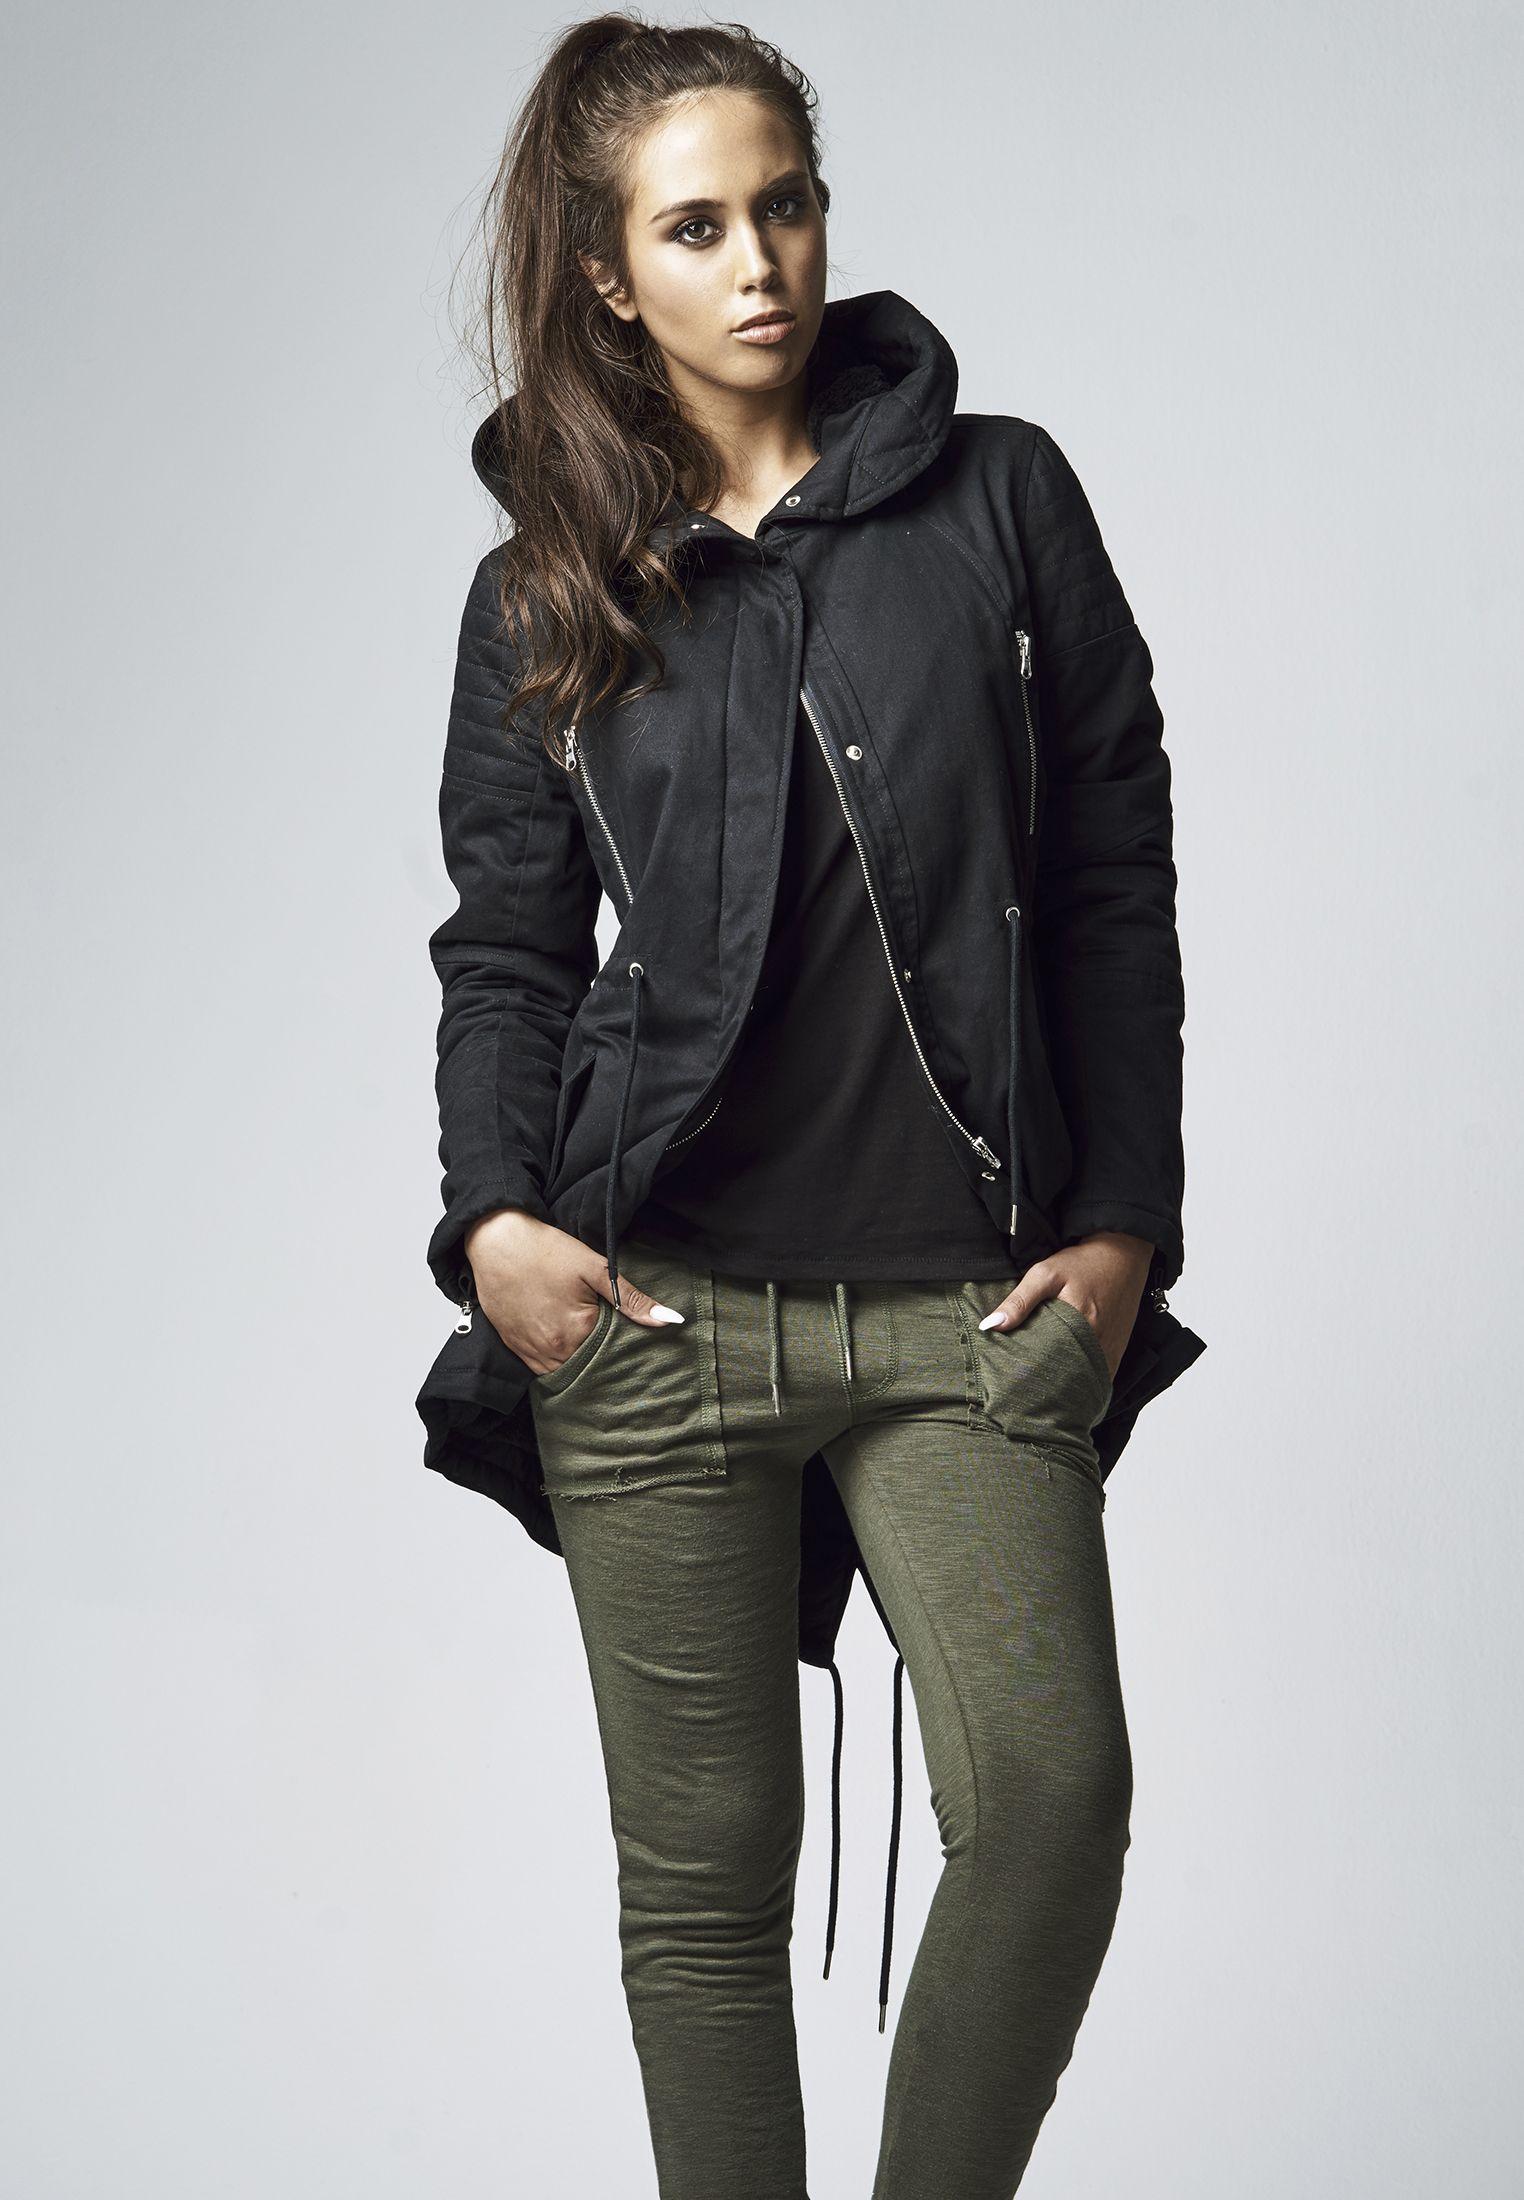 helle n Farbe viel rabatt genießen klassische Stile Kapatcha TB1370 Urban Classics Ladies Sherpa Lined Cotton ...